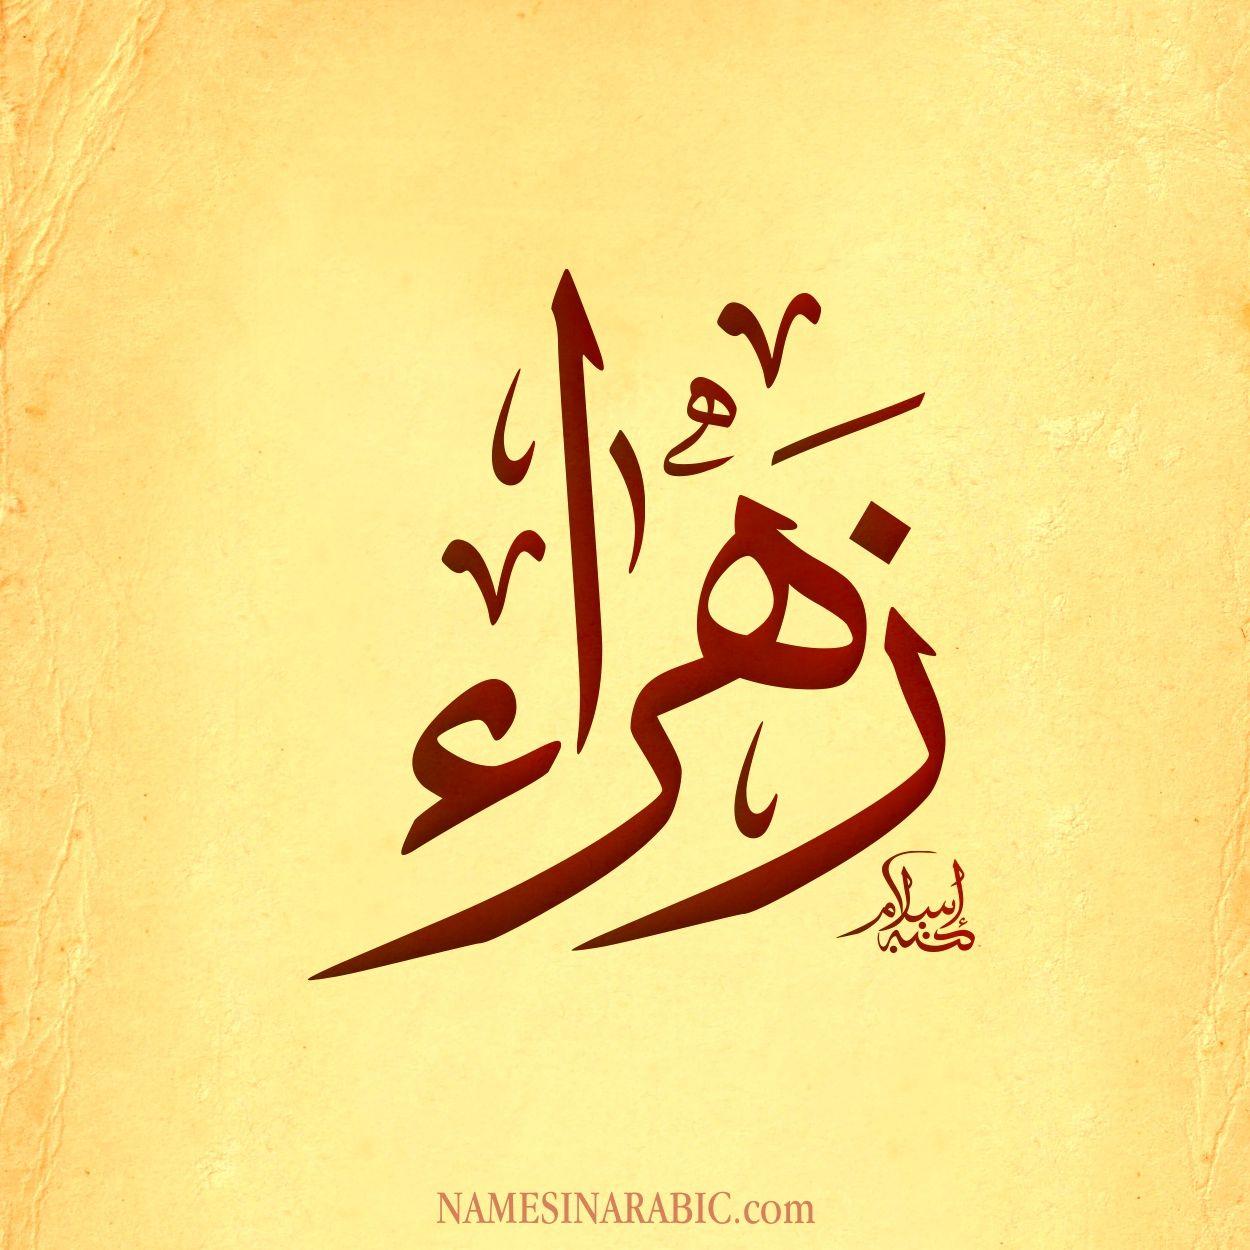 صور اسم زهراء ابرز الزخارف والنقوش لاسم زهراء 7383 3 Arabic Calligraphy Books Art